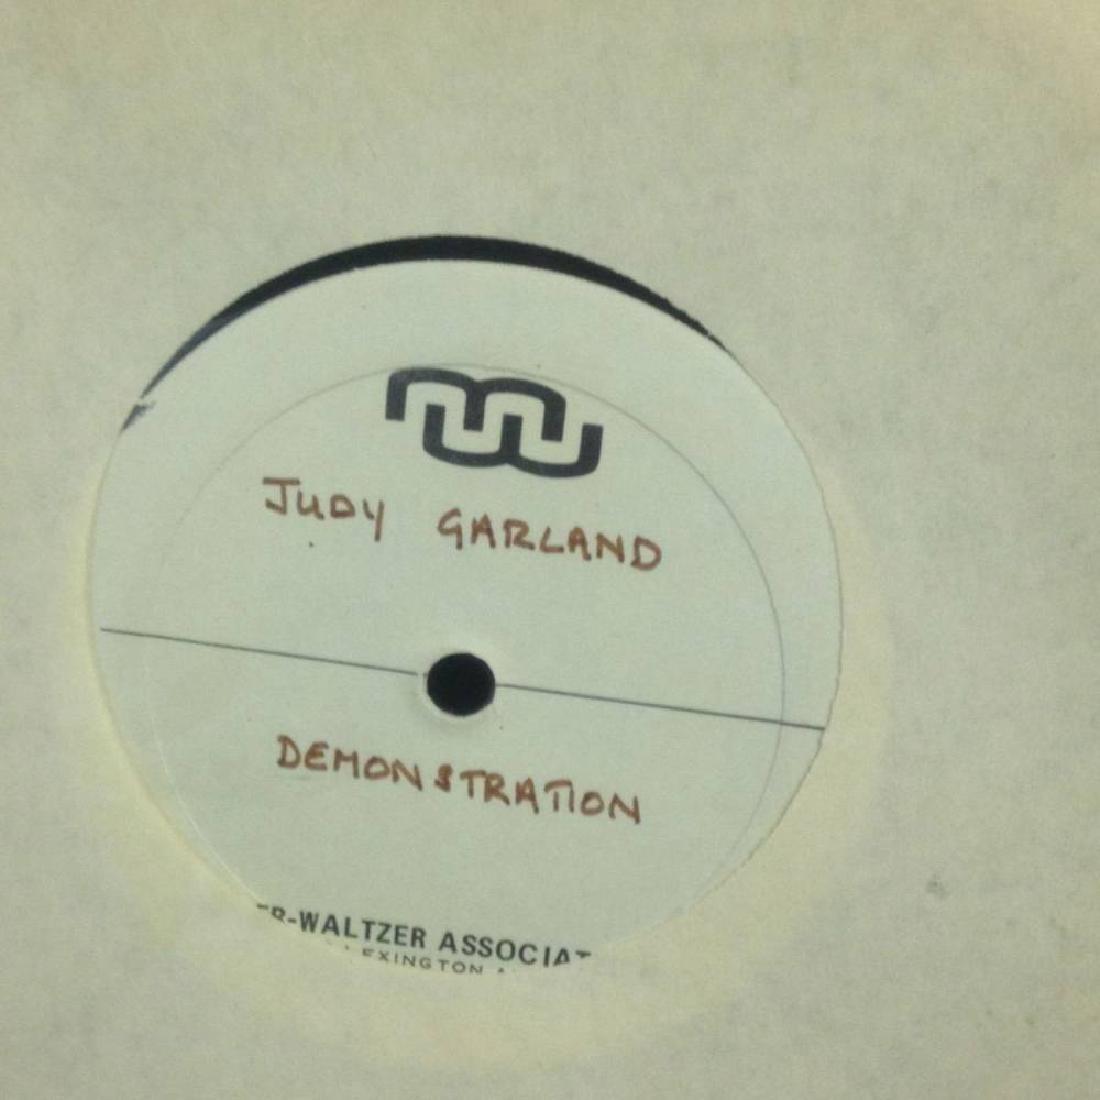 Pair Of Demo Records Judy Garland And Mixed Music - 3